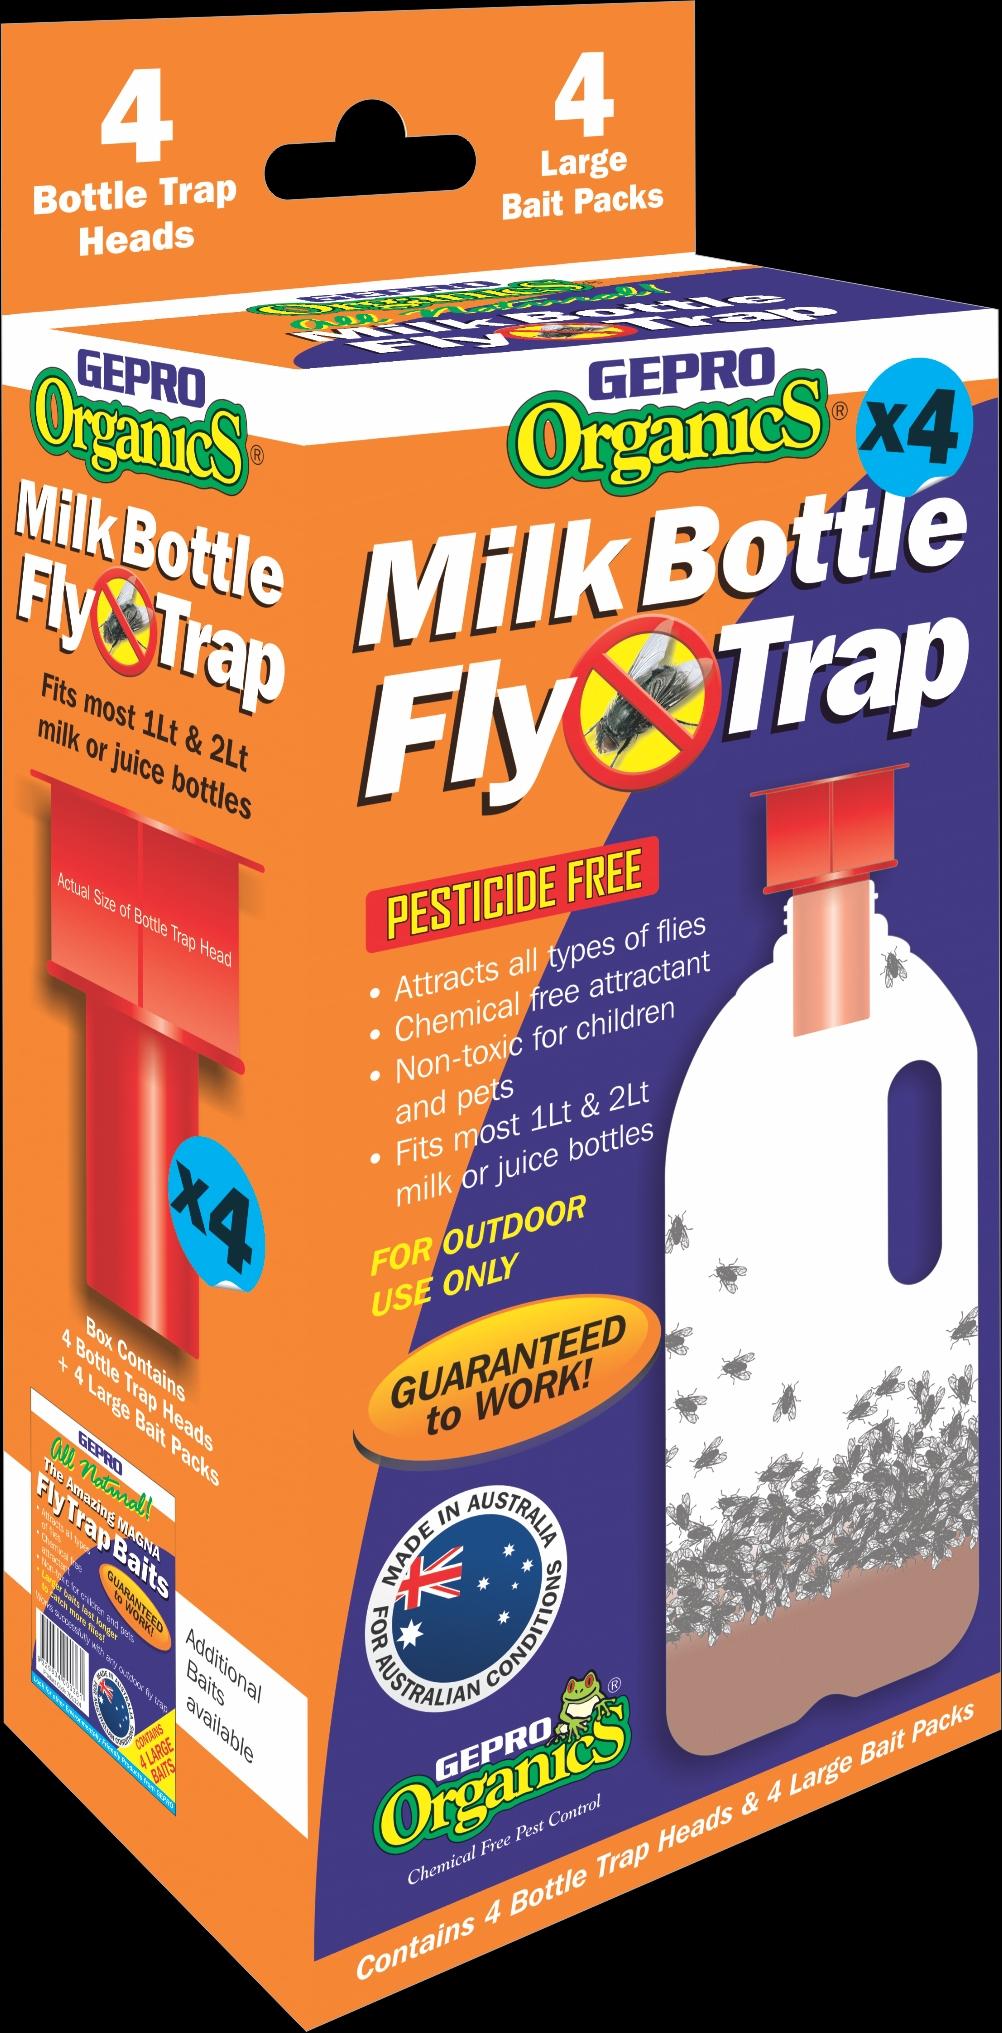 Gepro Organics Milk Bottle Fly Trap